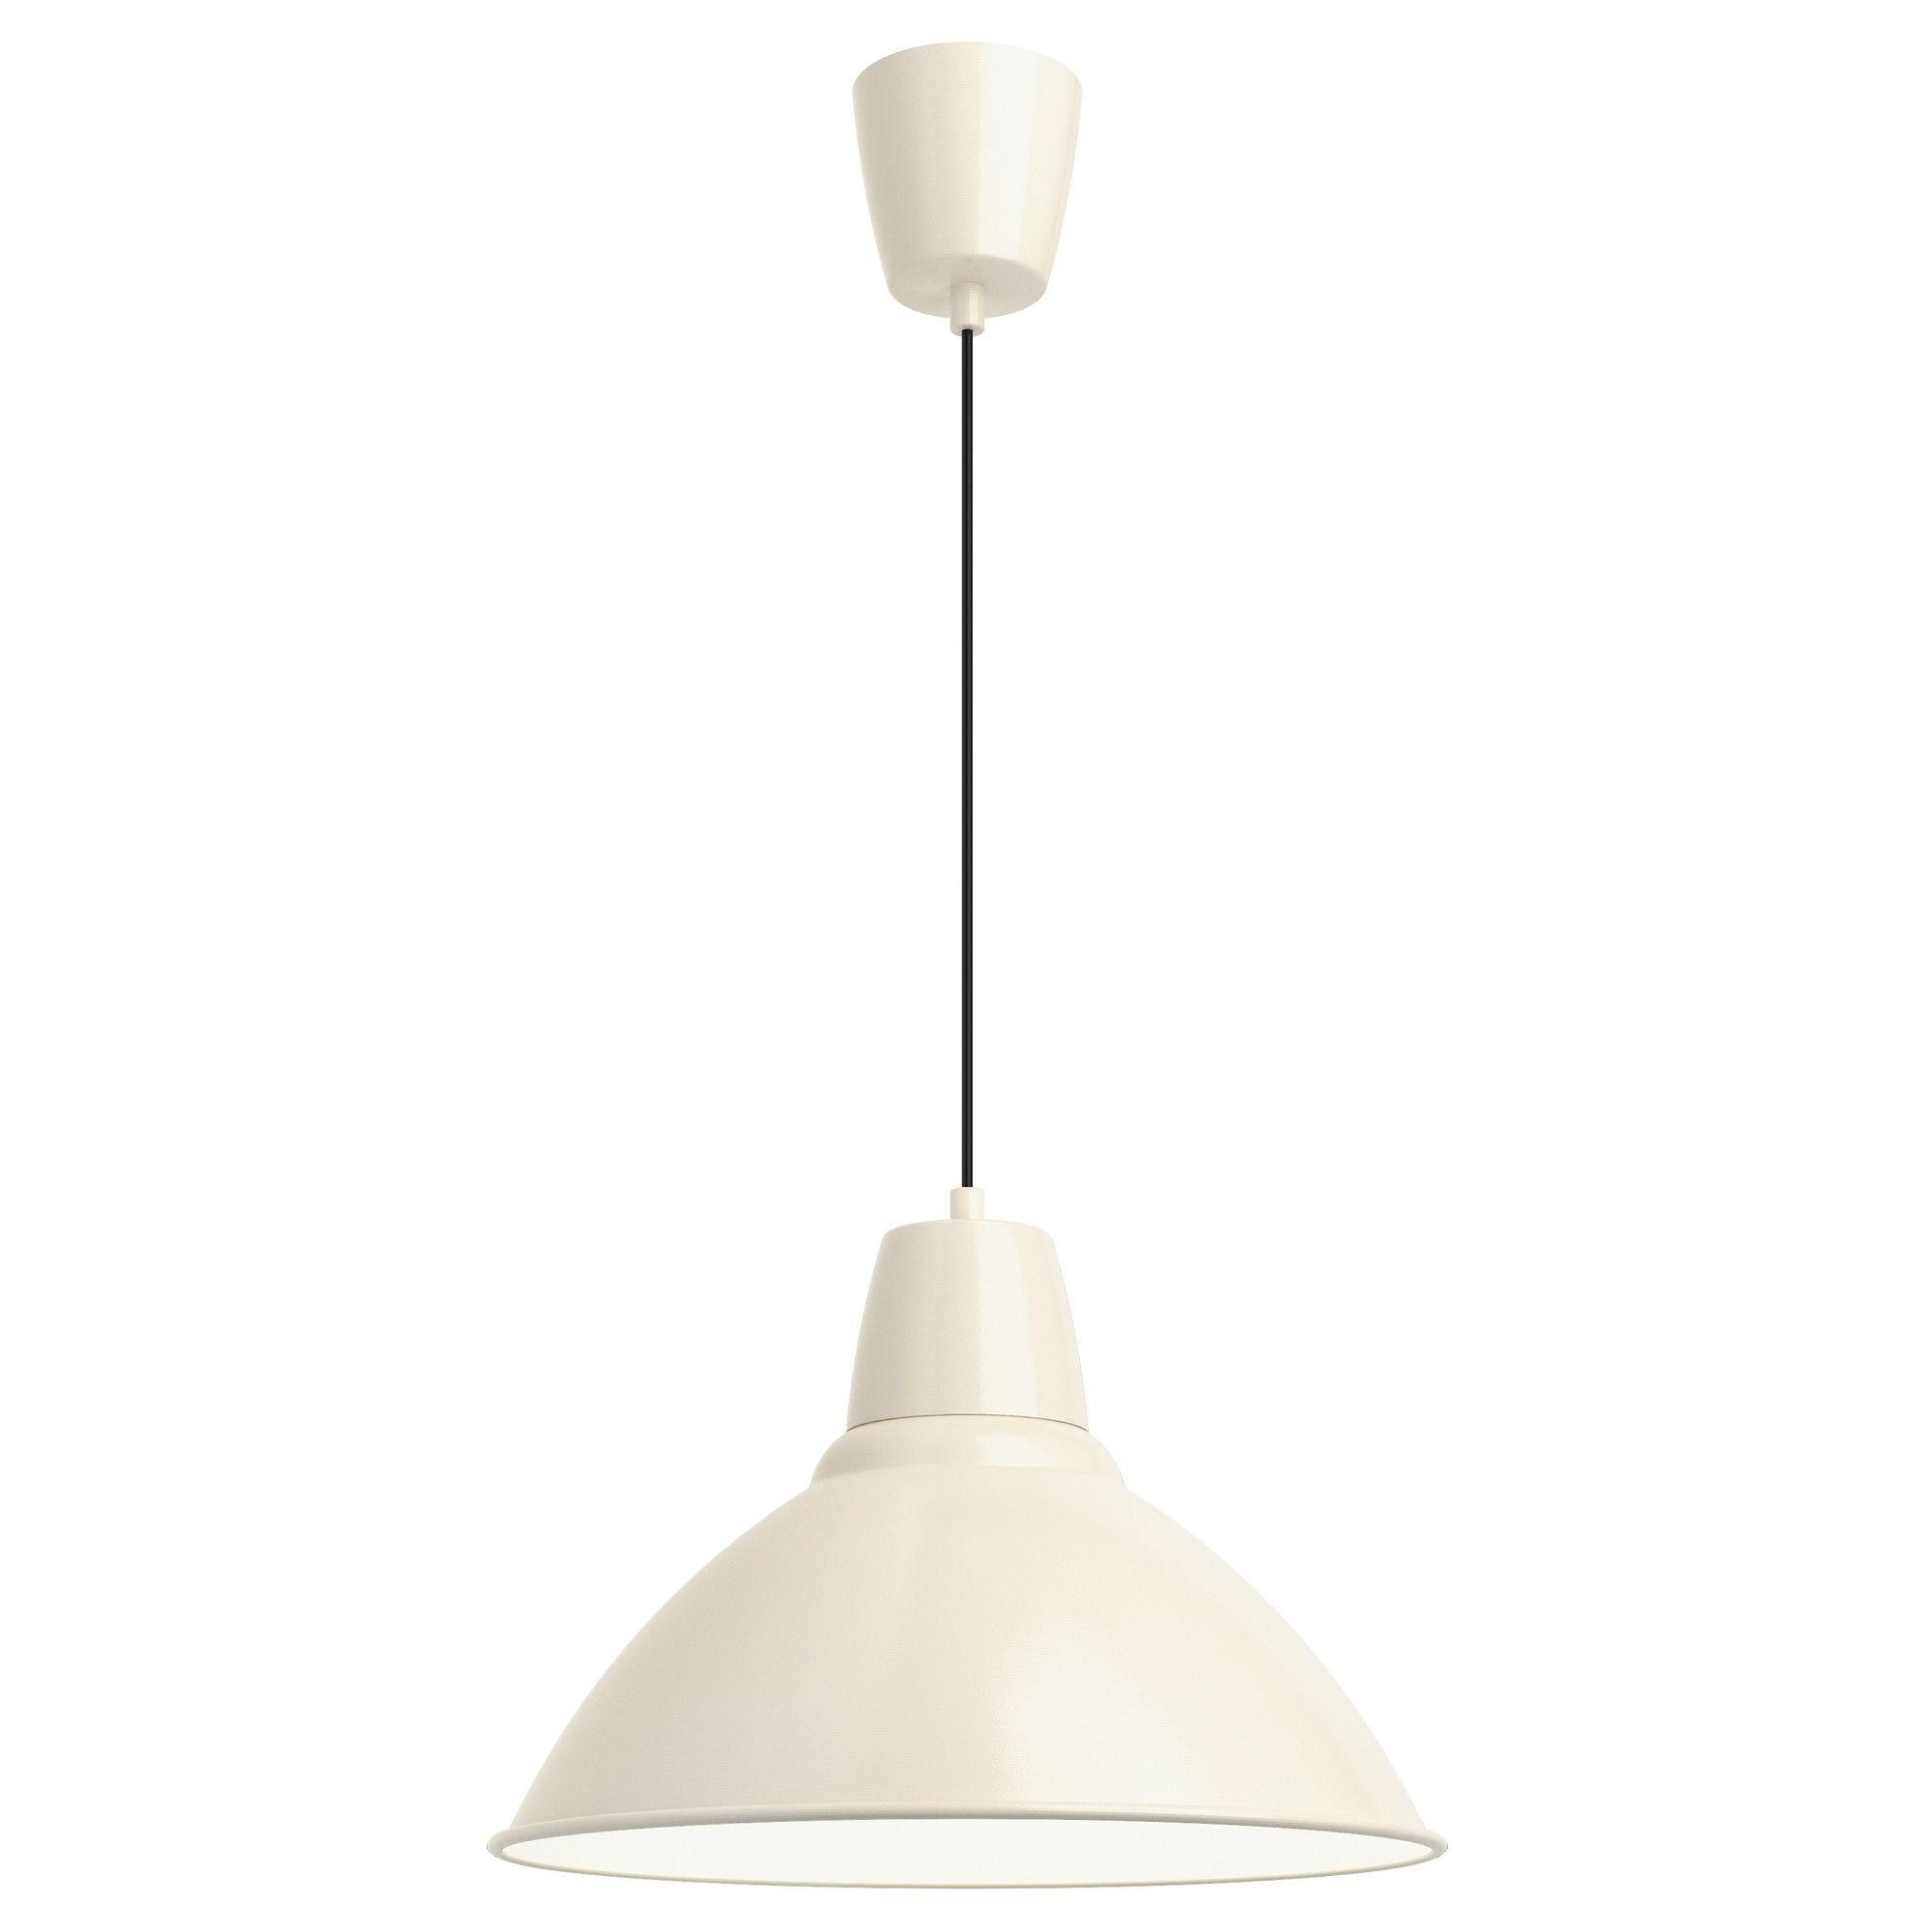 Foto pendant lamp offwhite pendant lamps pendants and kitchens